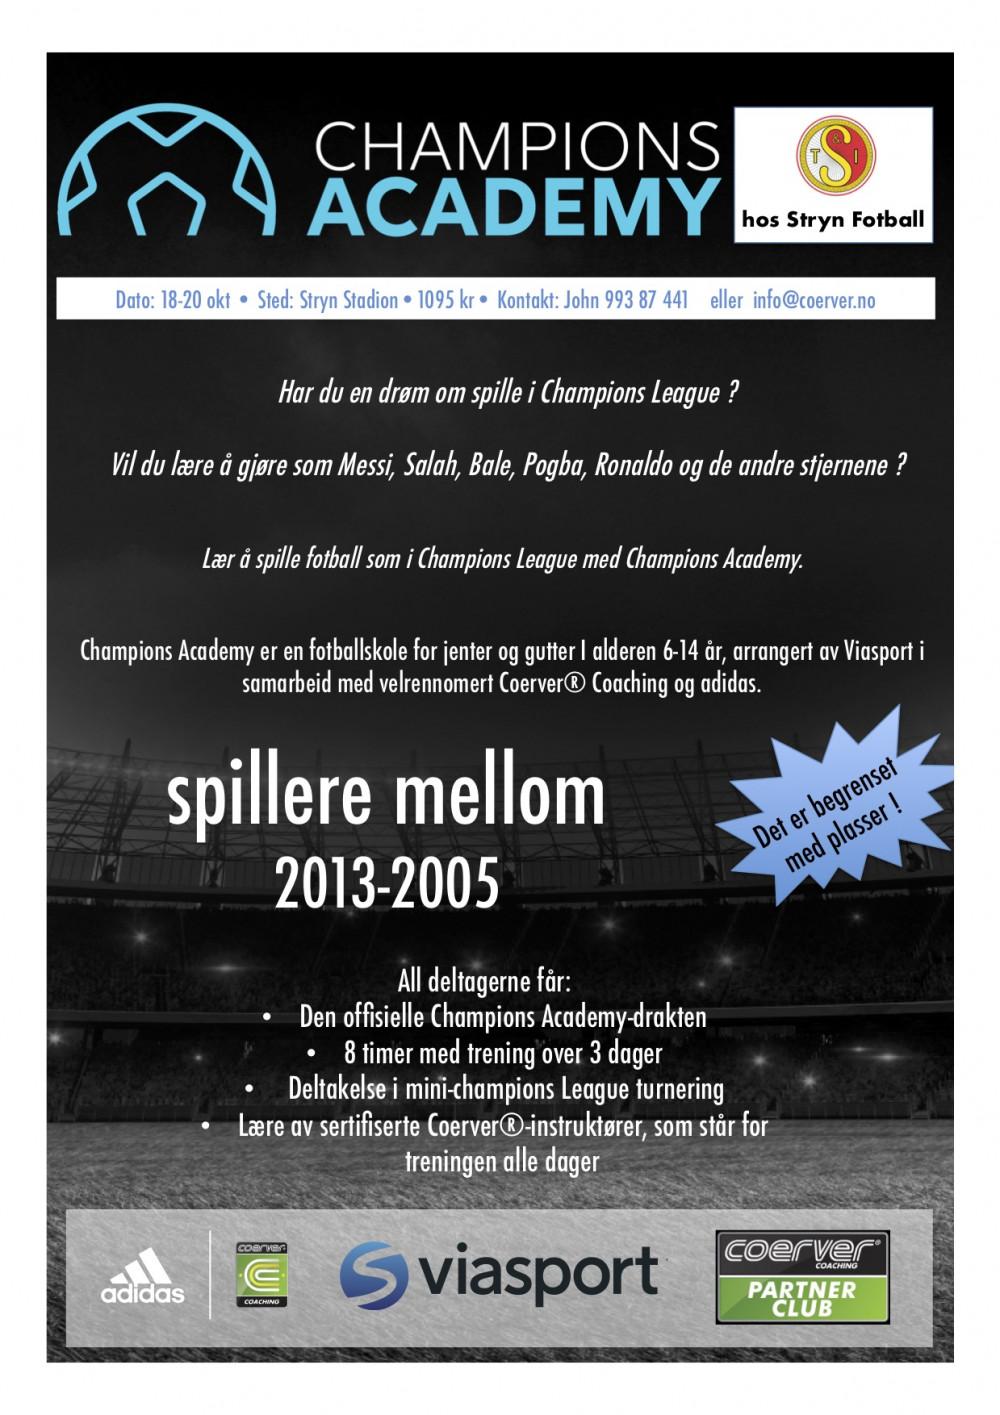 Champions Academy hos Stryn Fotball okt 18-20